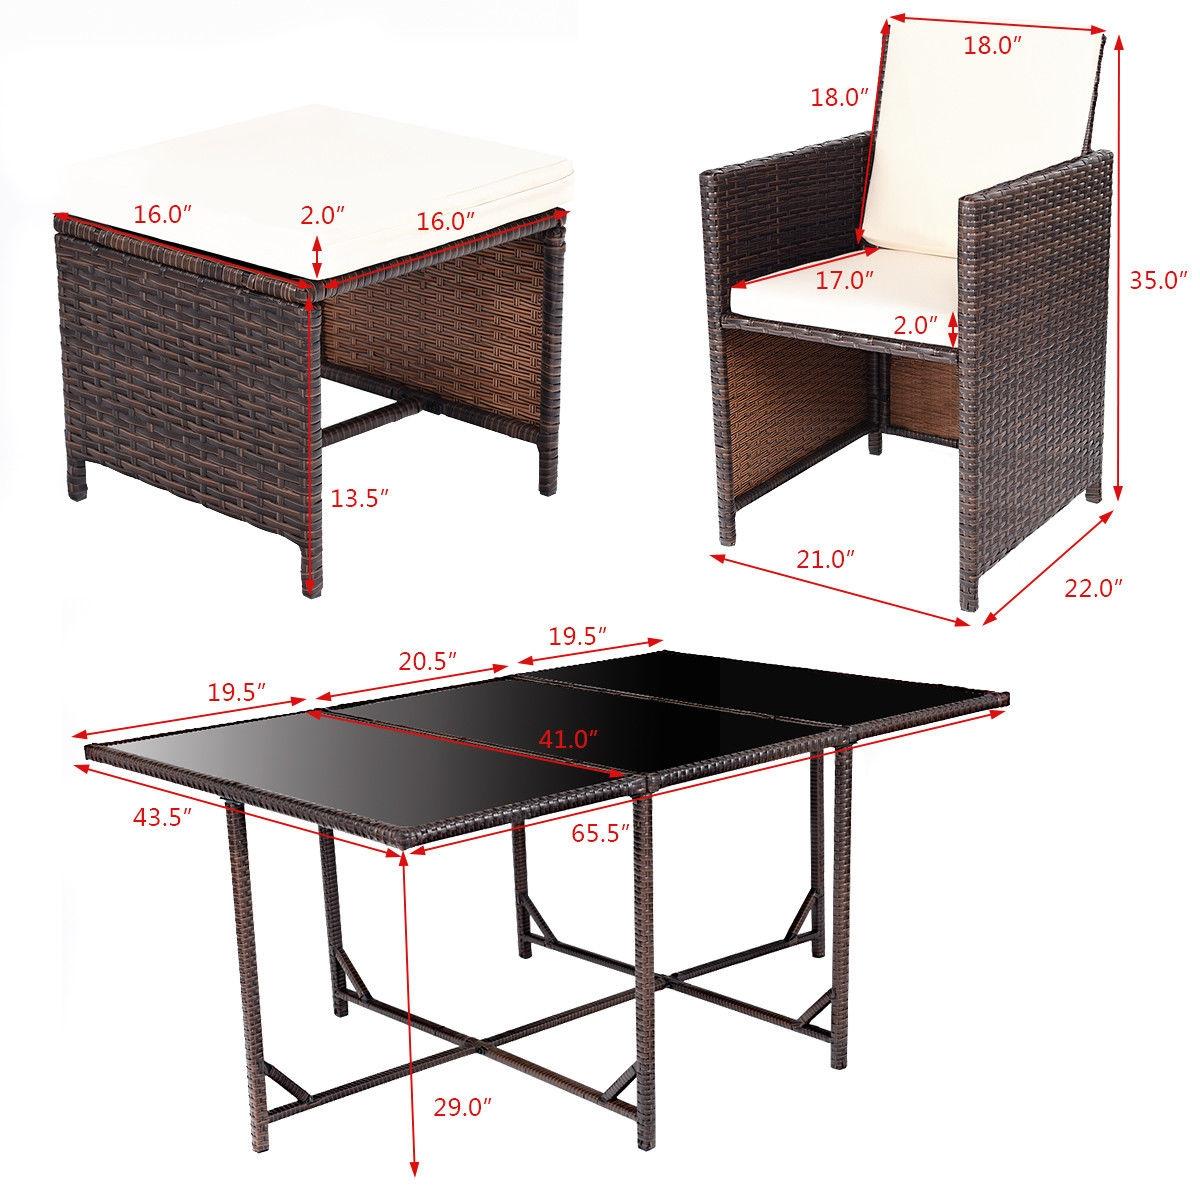 11 pcs Outdoor Patio Dining Rattan Wicker Furniture Set